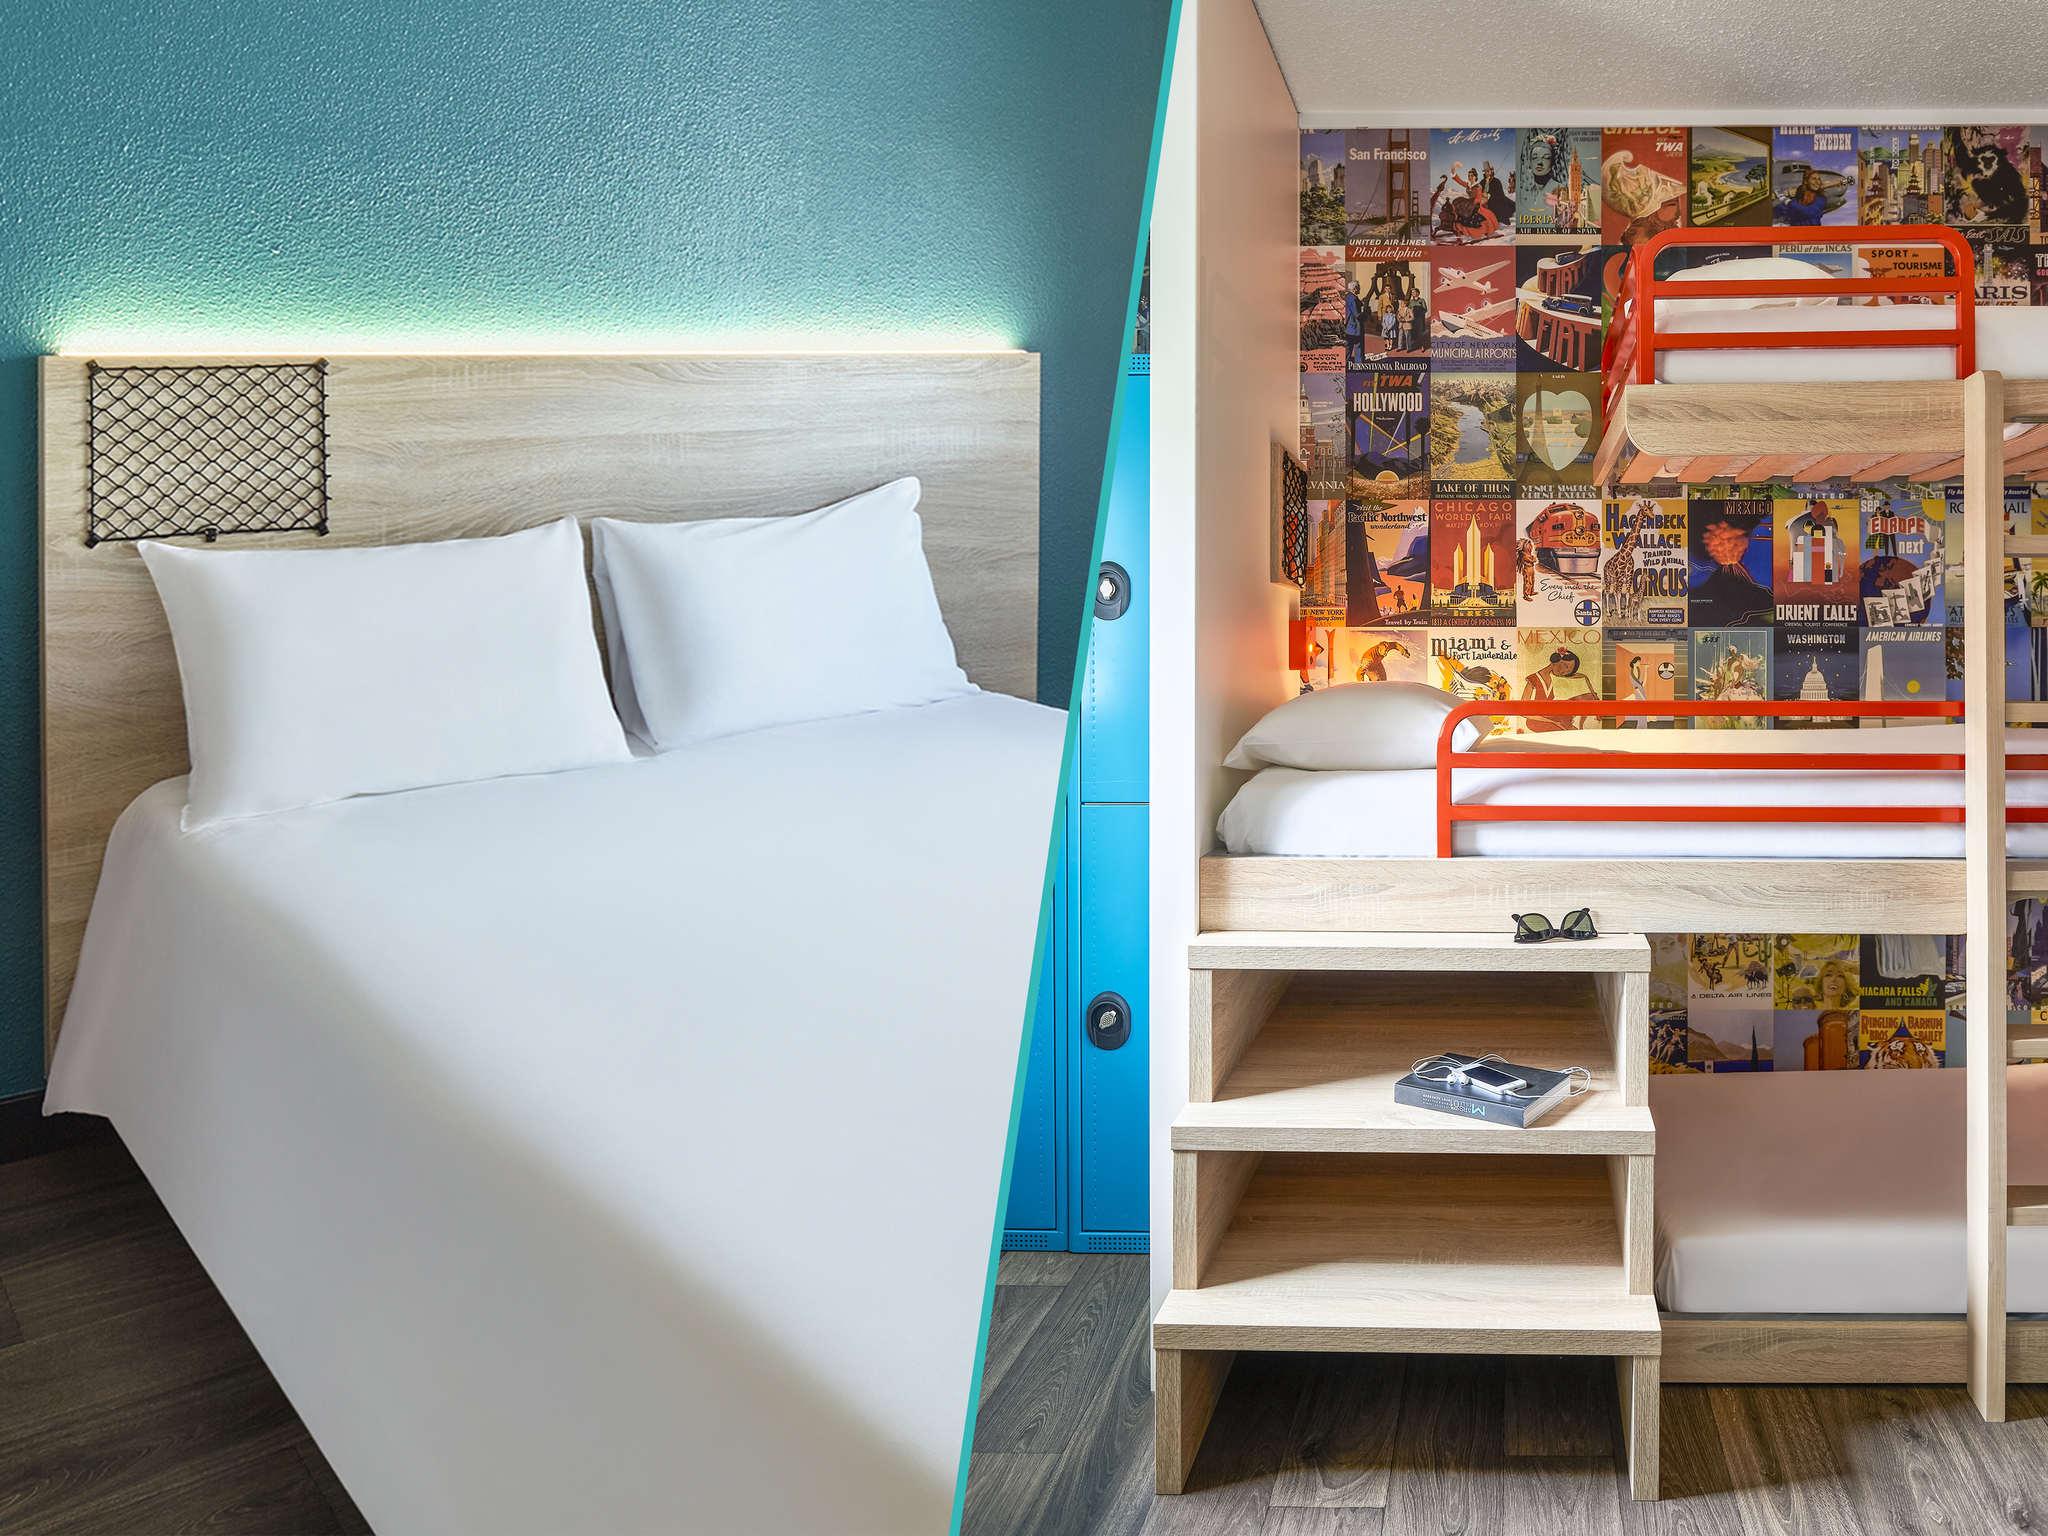 Hotel – hotelF1 Parijs Porte de Châtillon